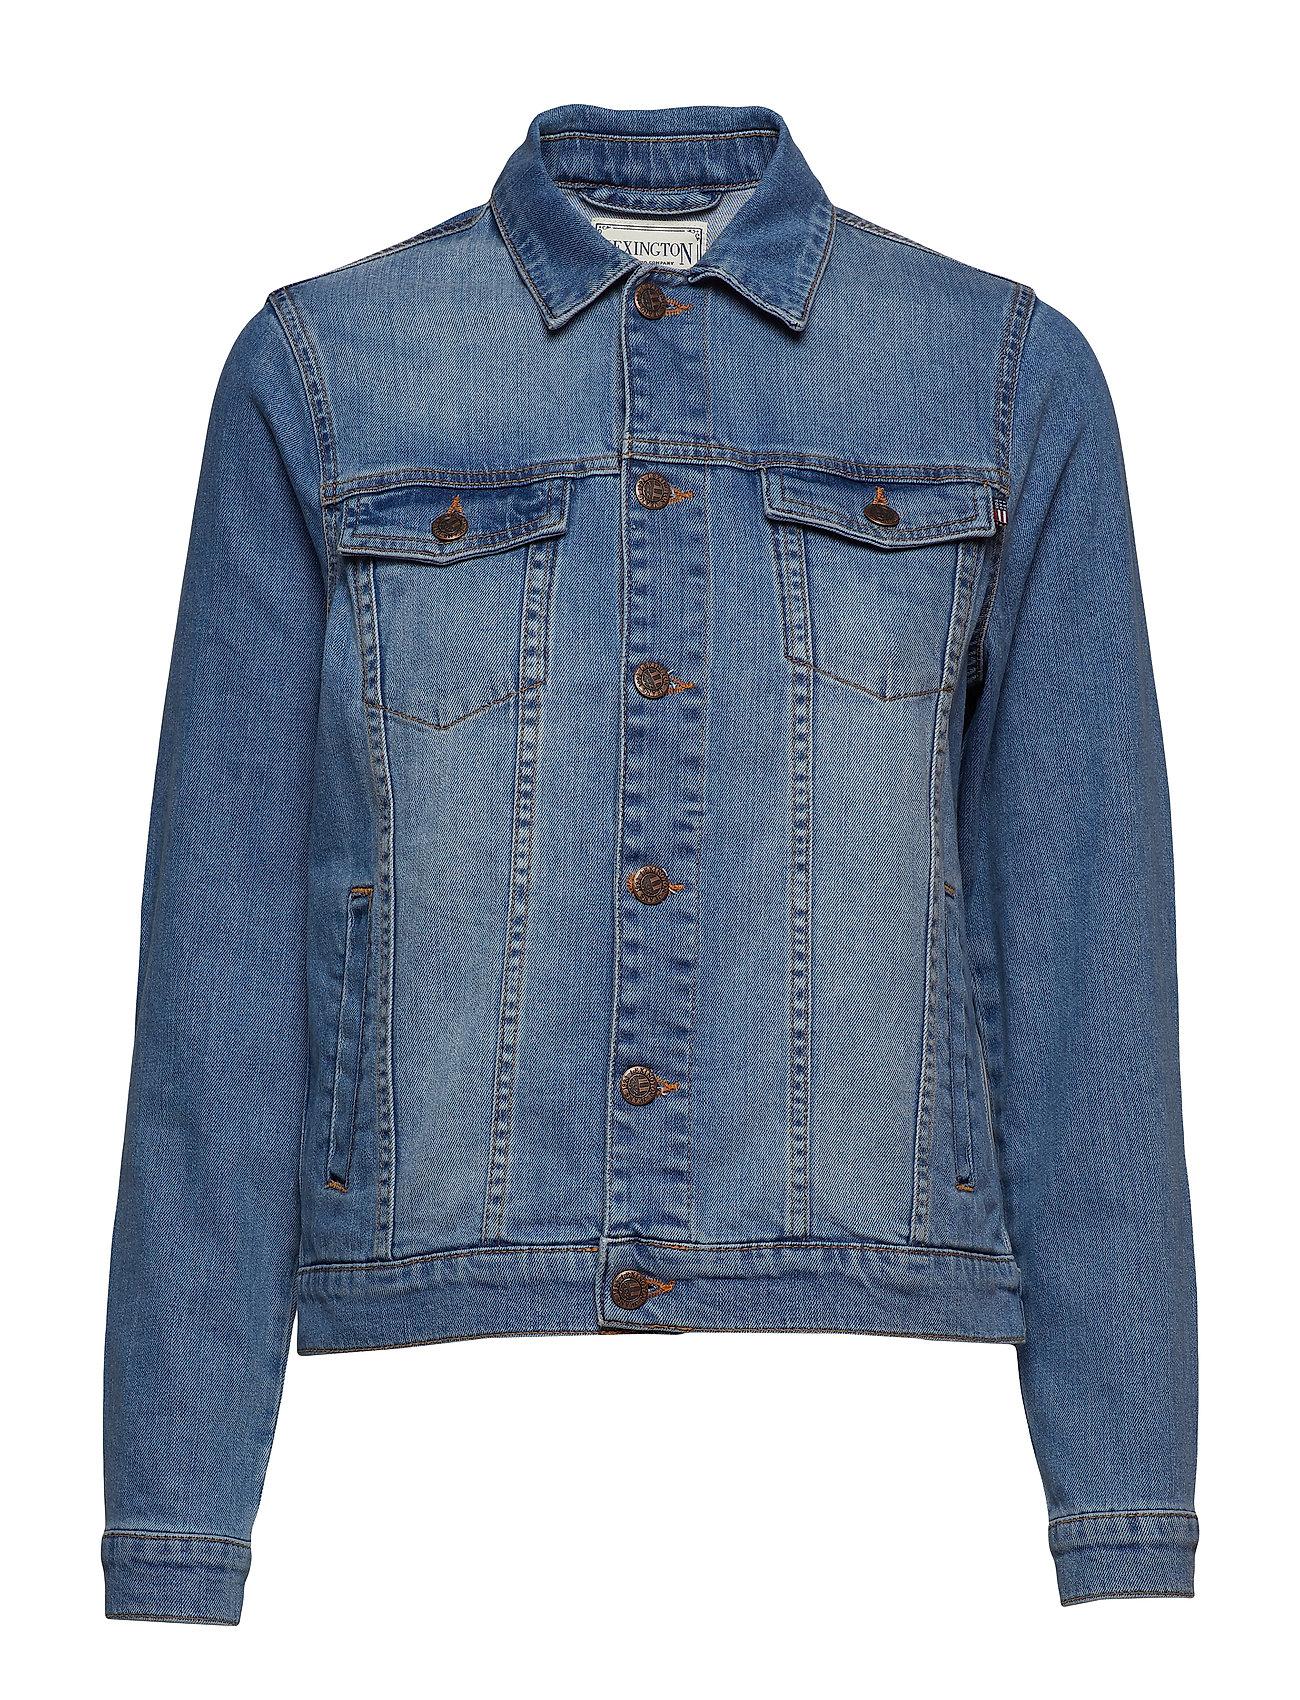 Lexington Clothing Marcie Blue Denim Jacket - LT BLUE DENIM